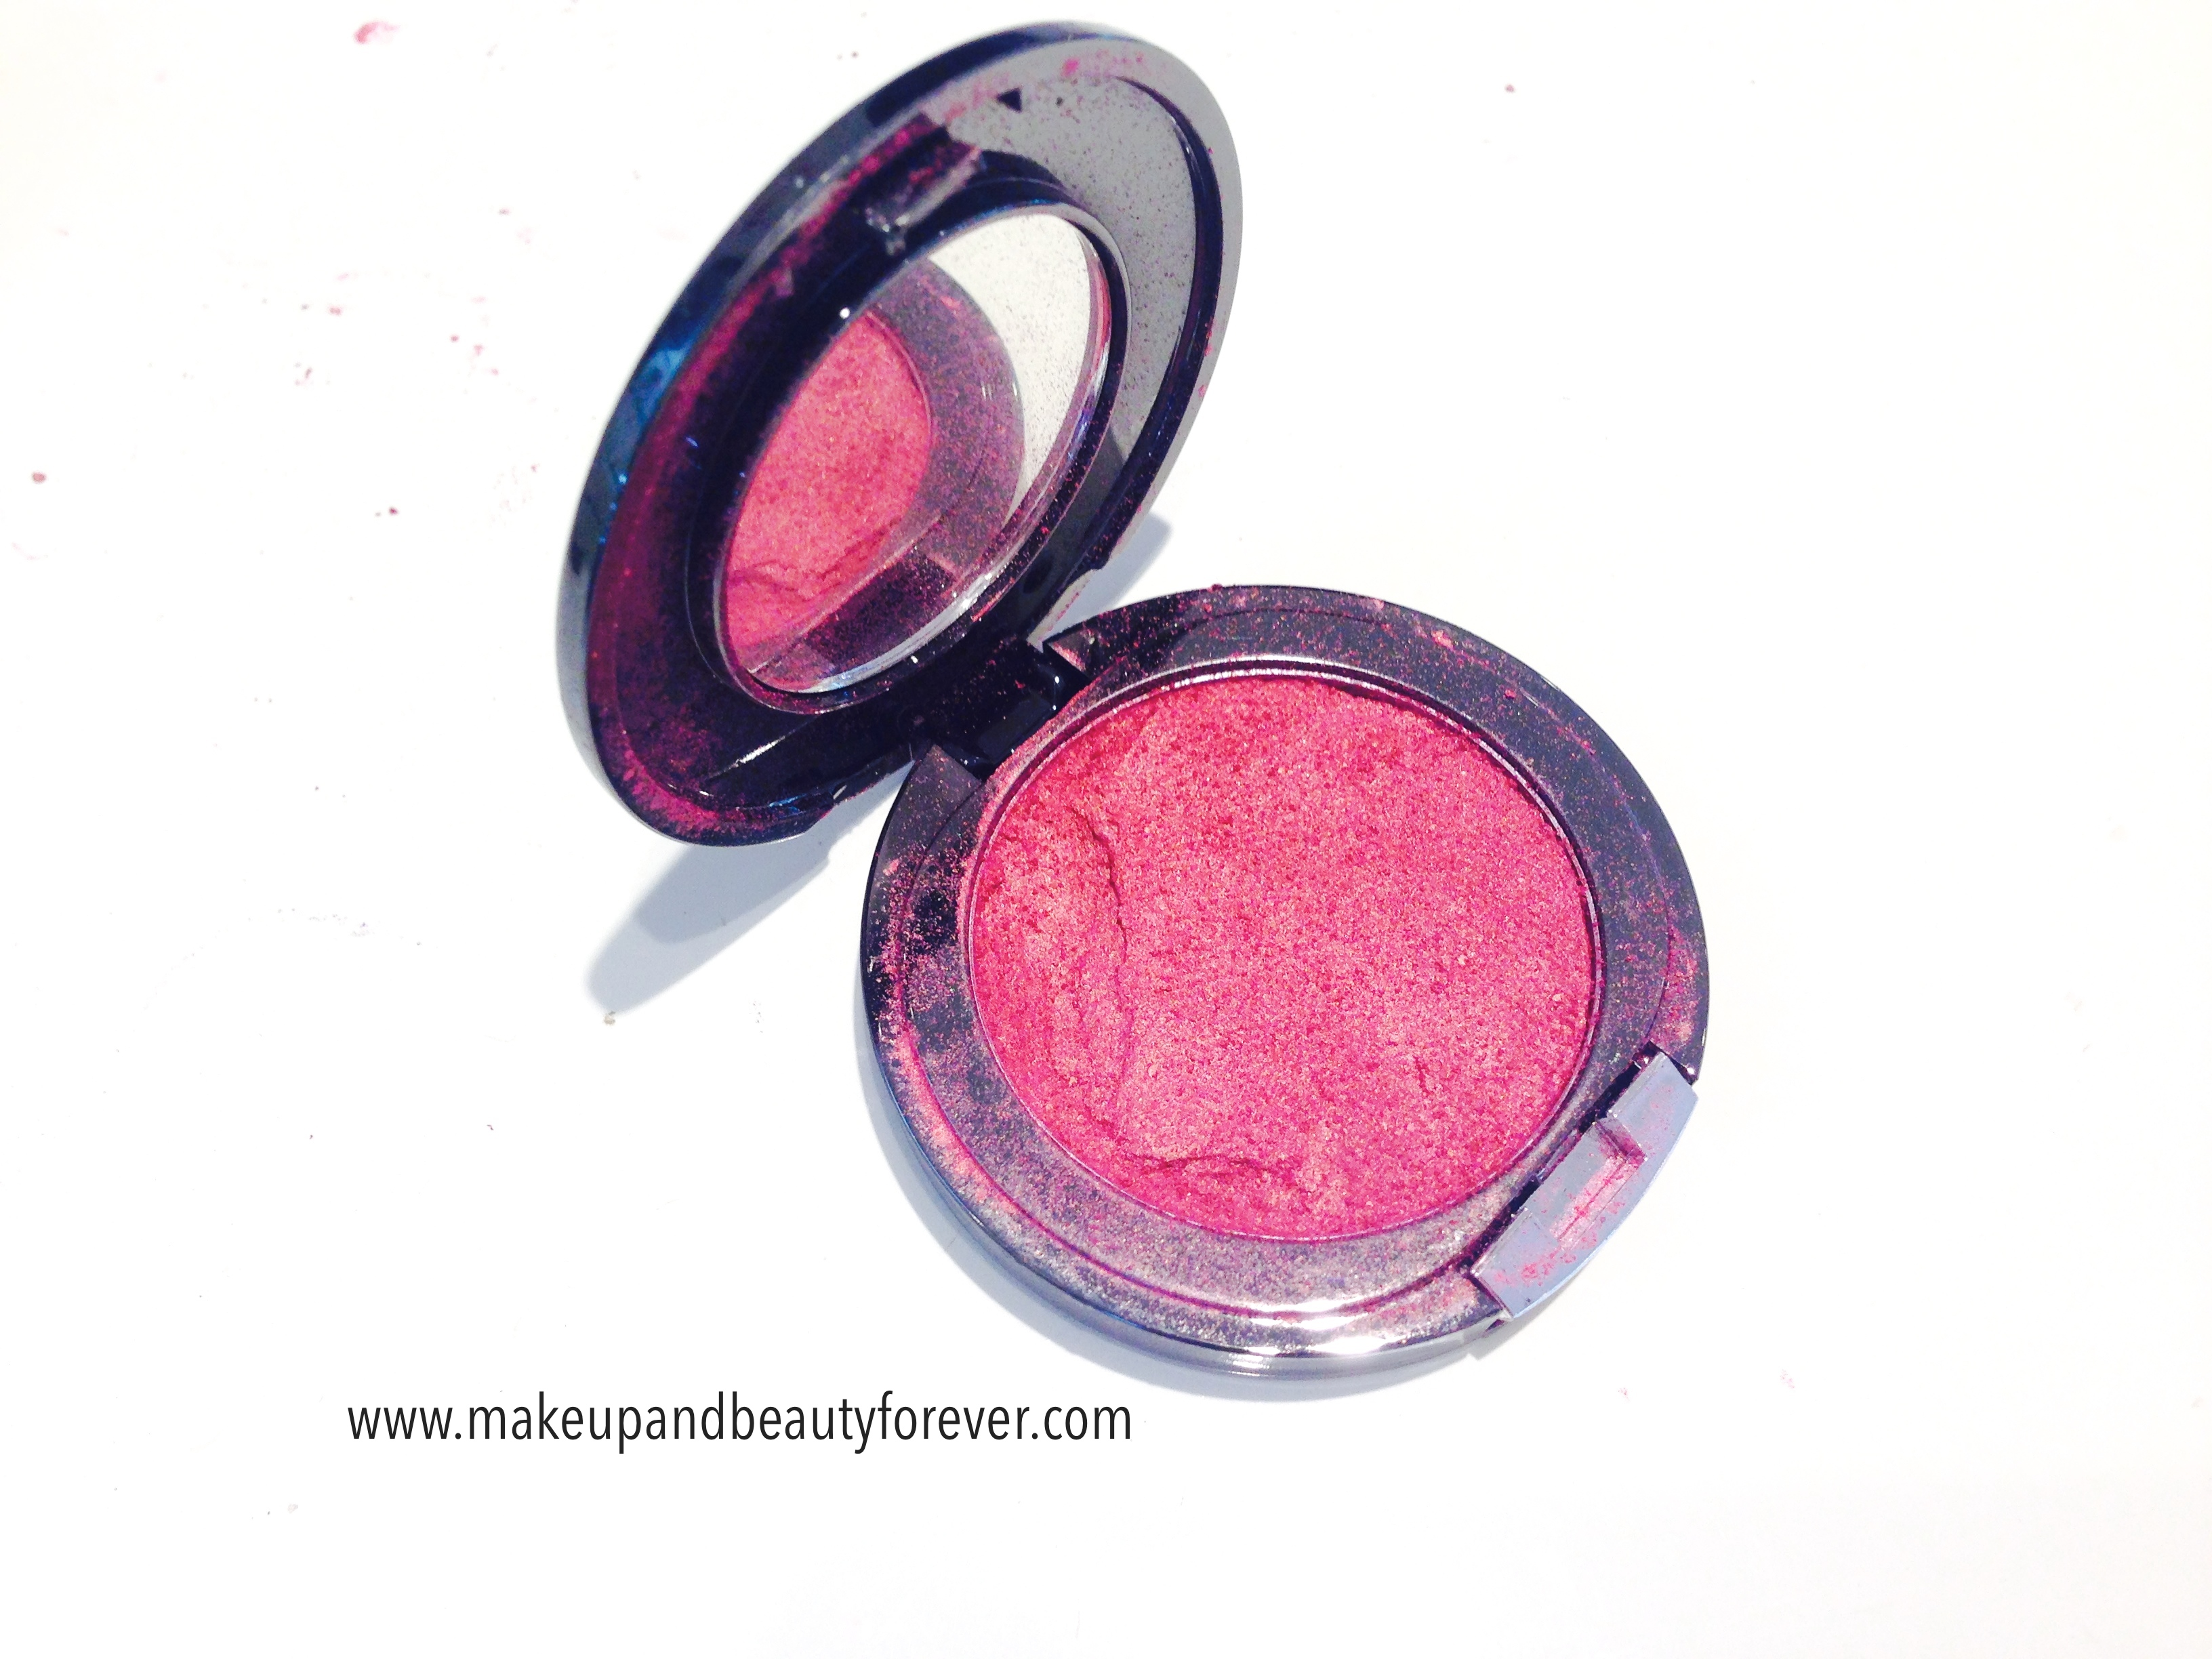 Faces Canada Glam On Powder Blush Crimson 4 Review